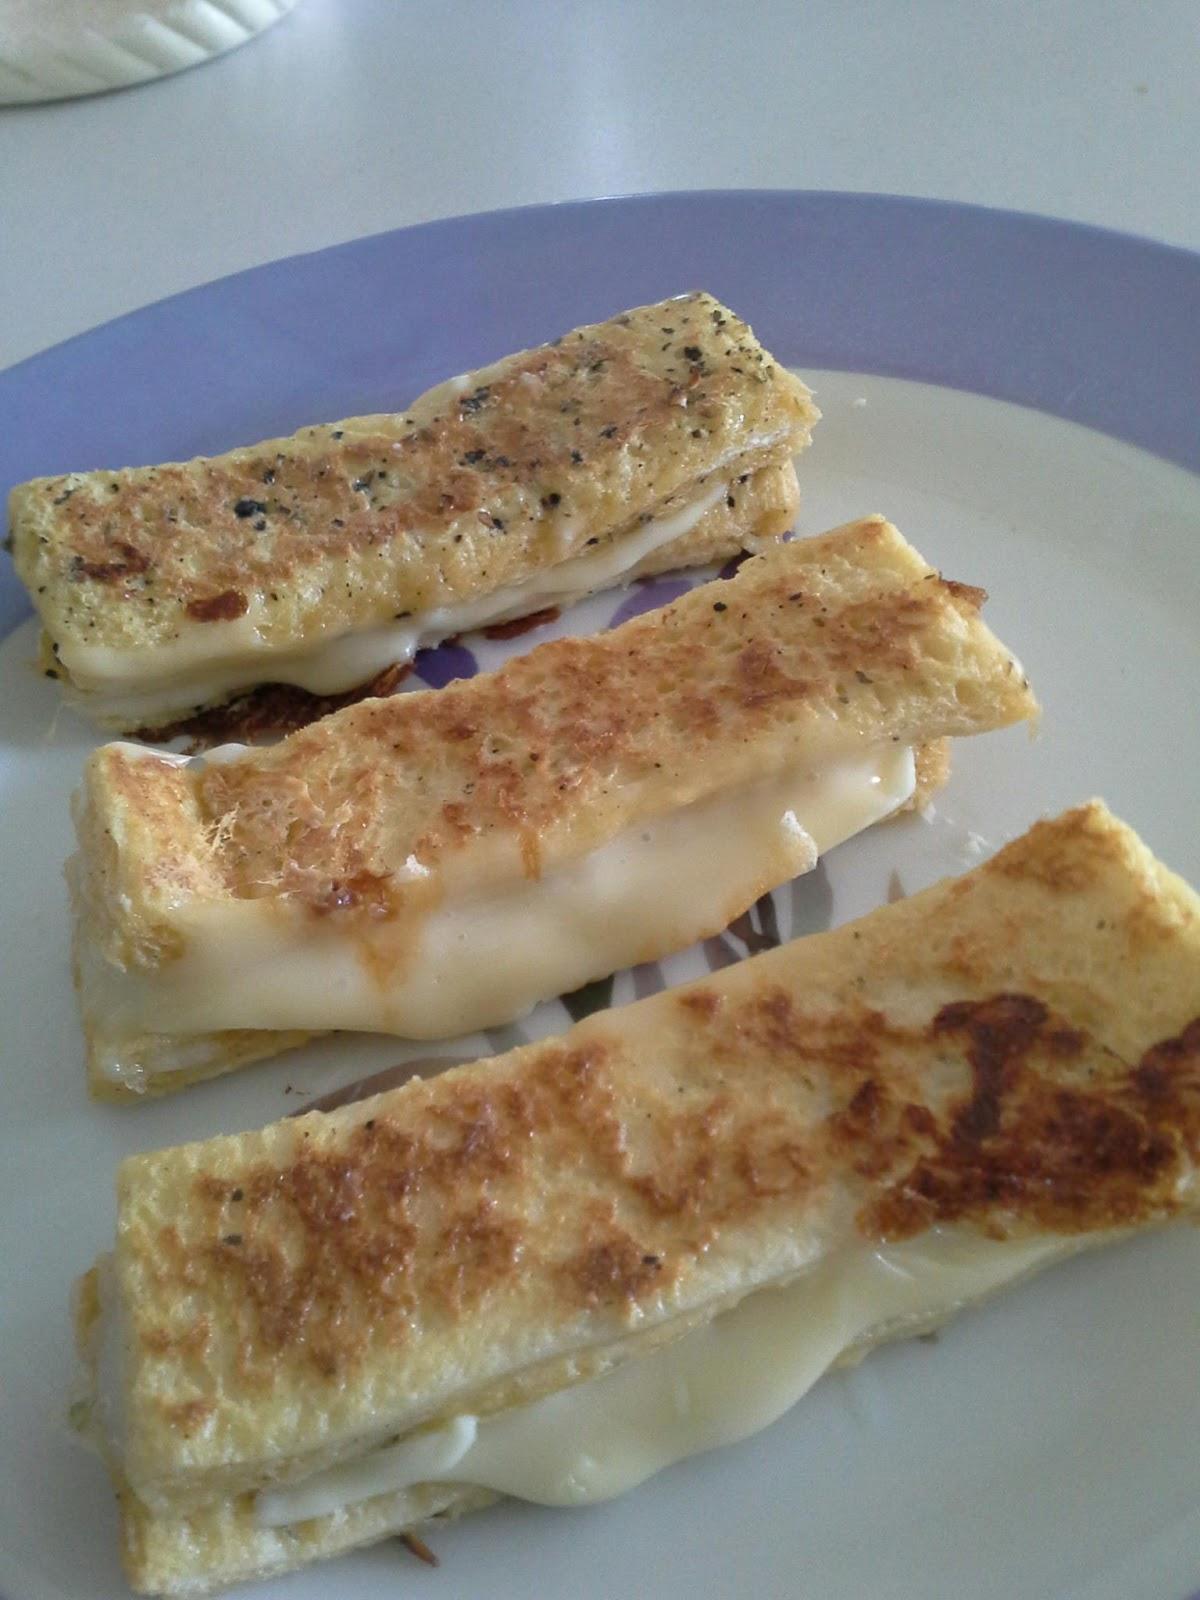 Resepi: Roti Telur Cheese leleh ~ #CeritaMak